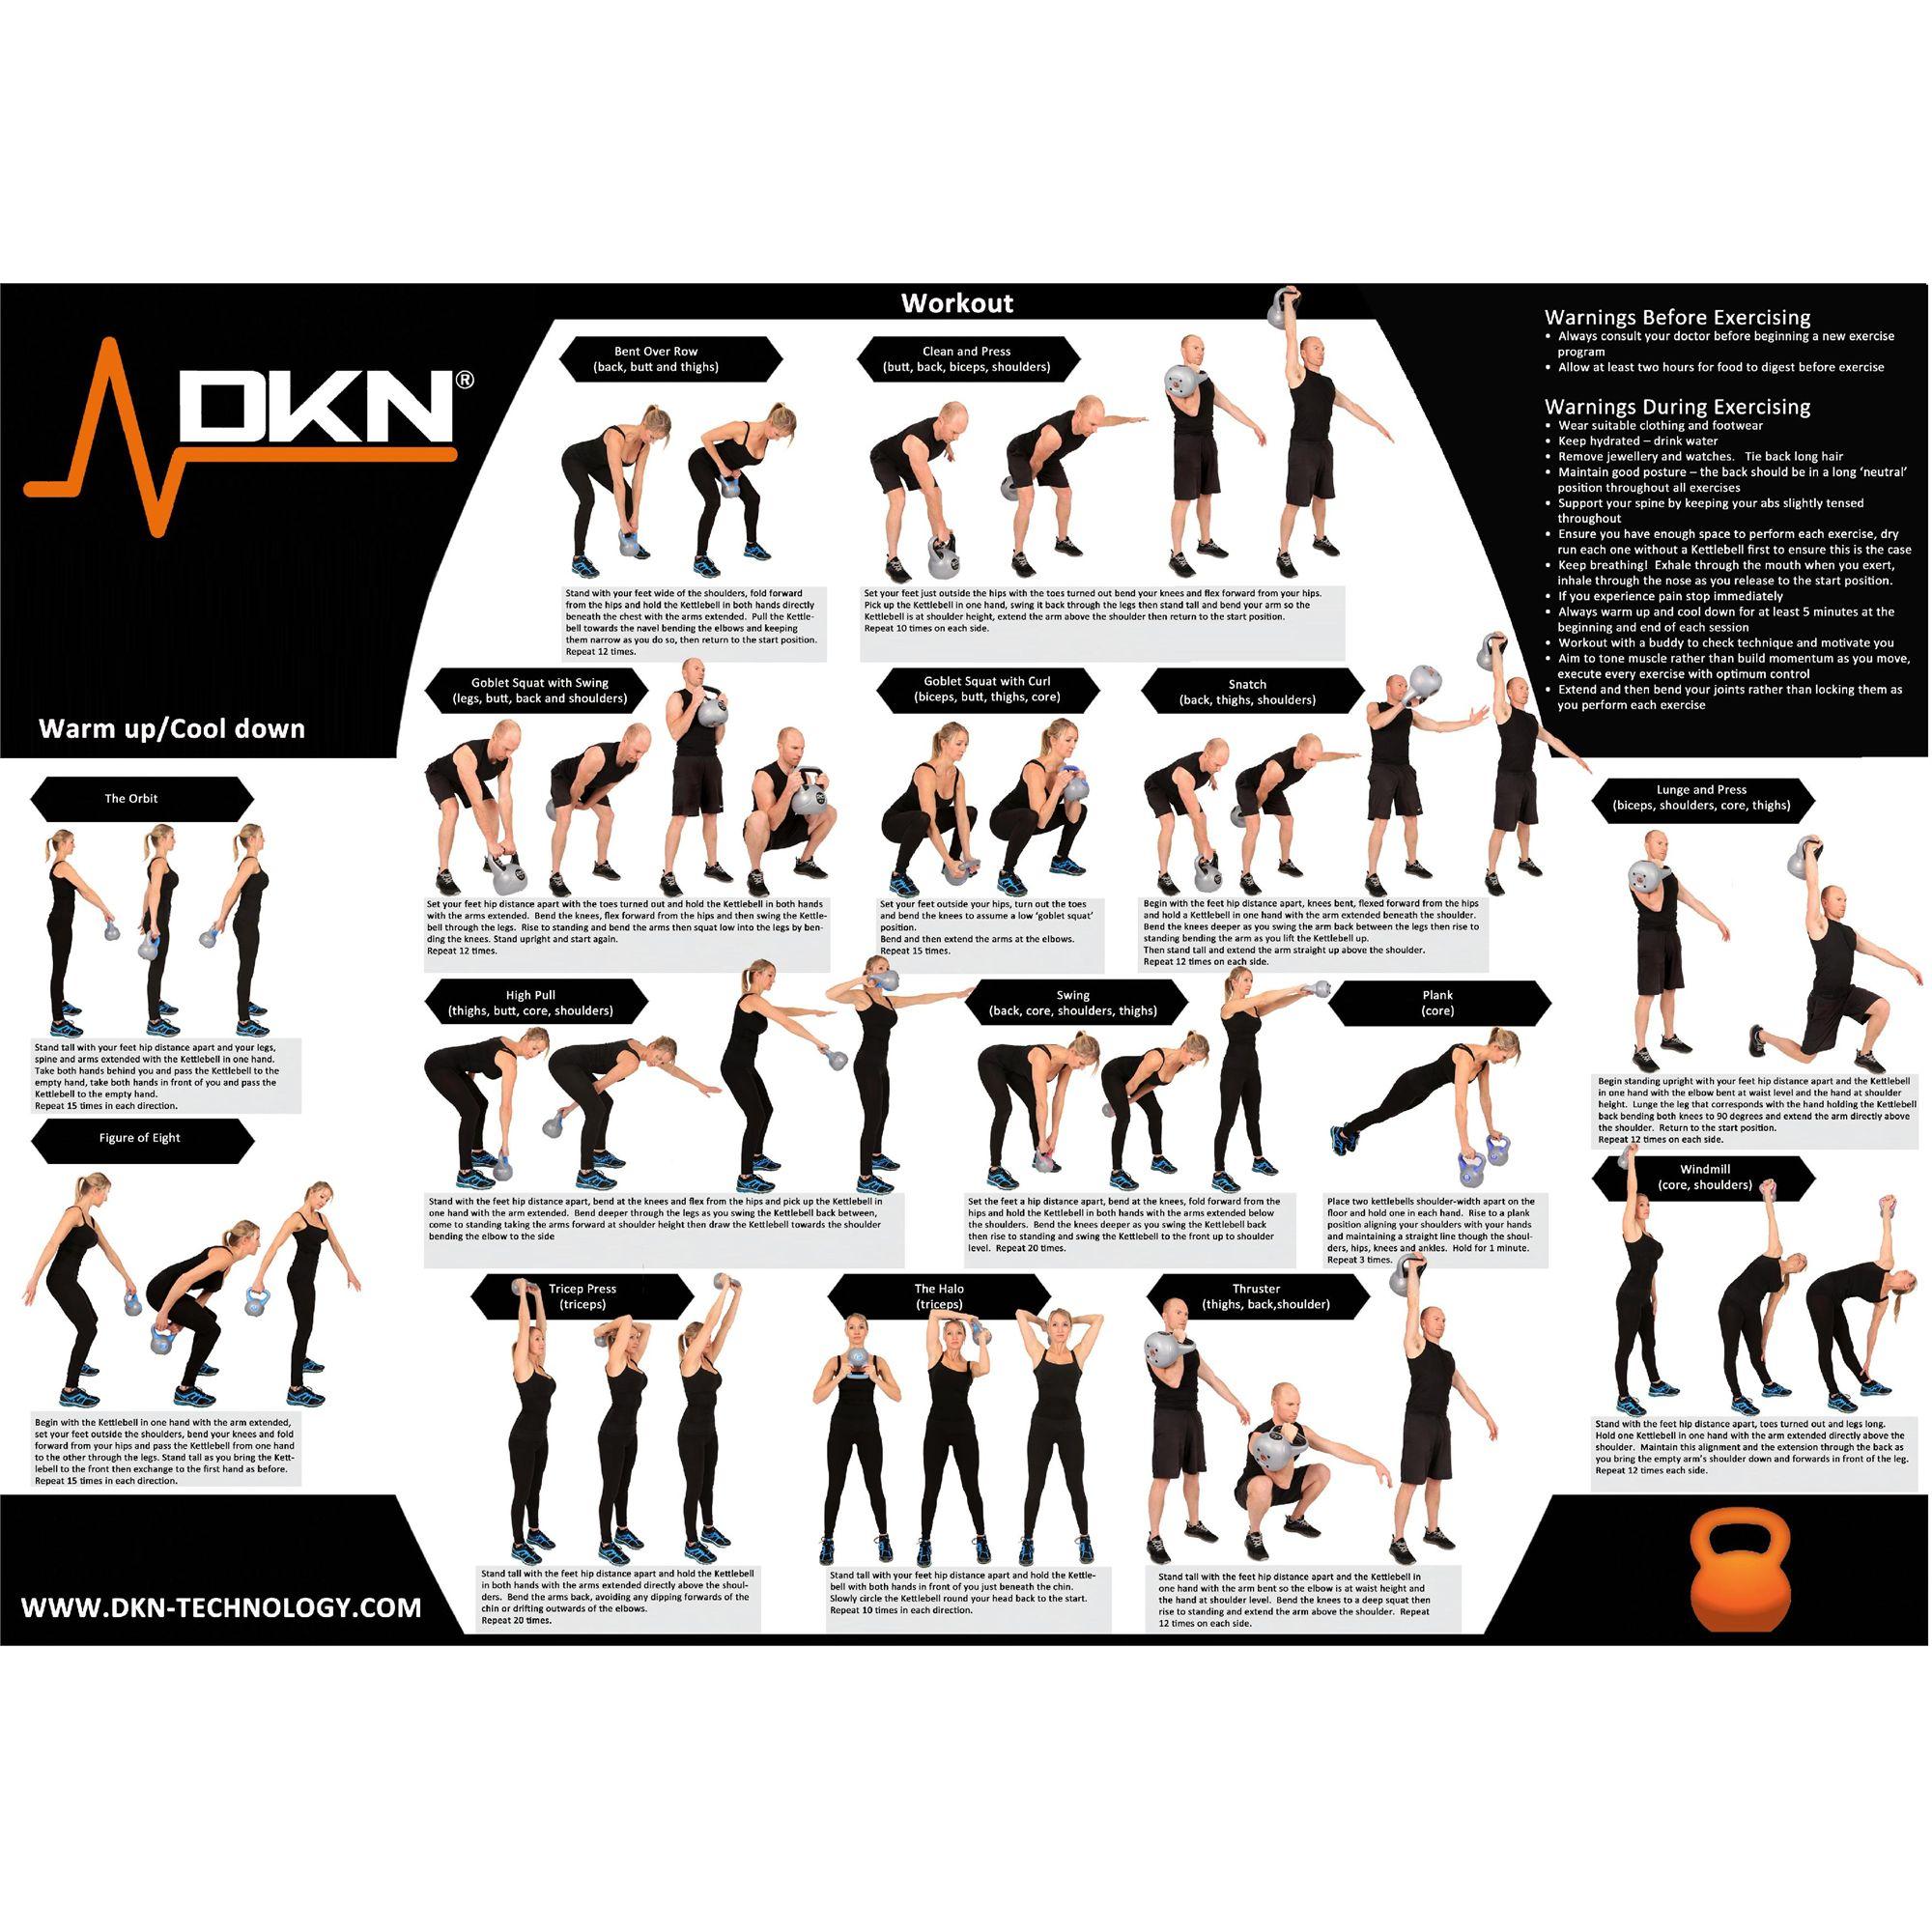 DKN 2, 4, 6 and 8kg Vinyl Kettlebell Weight Set